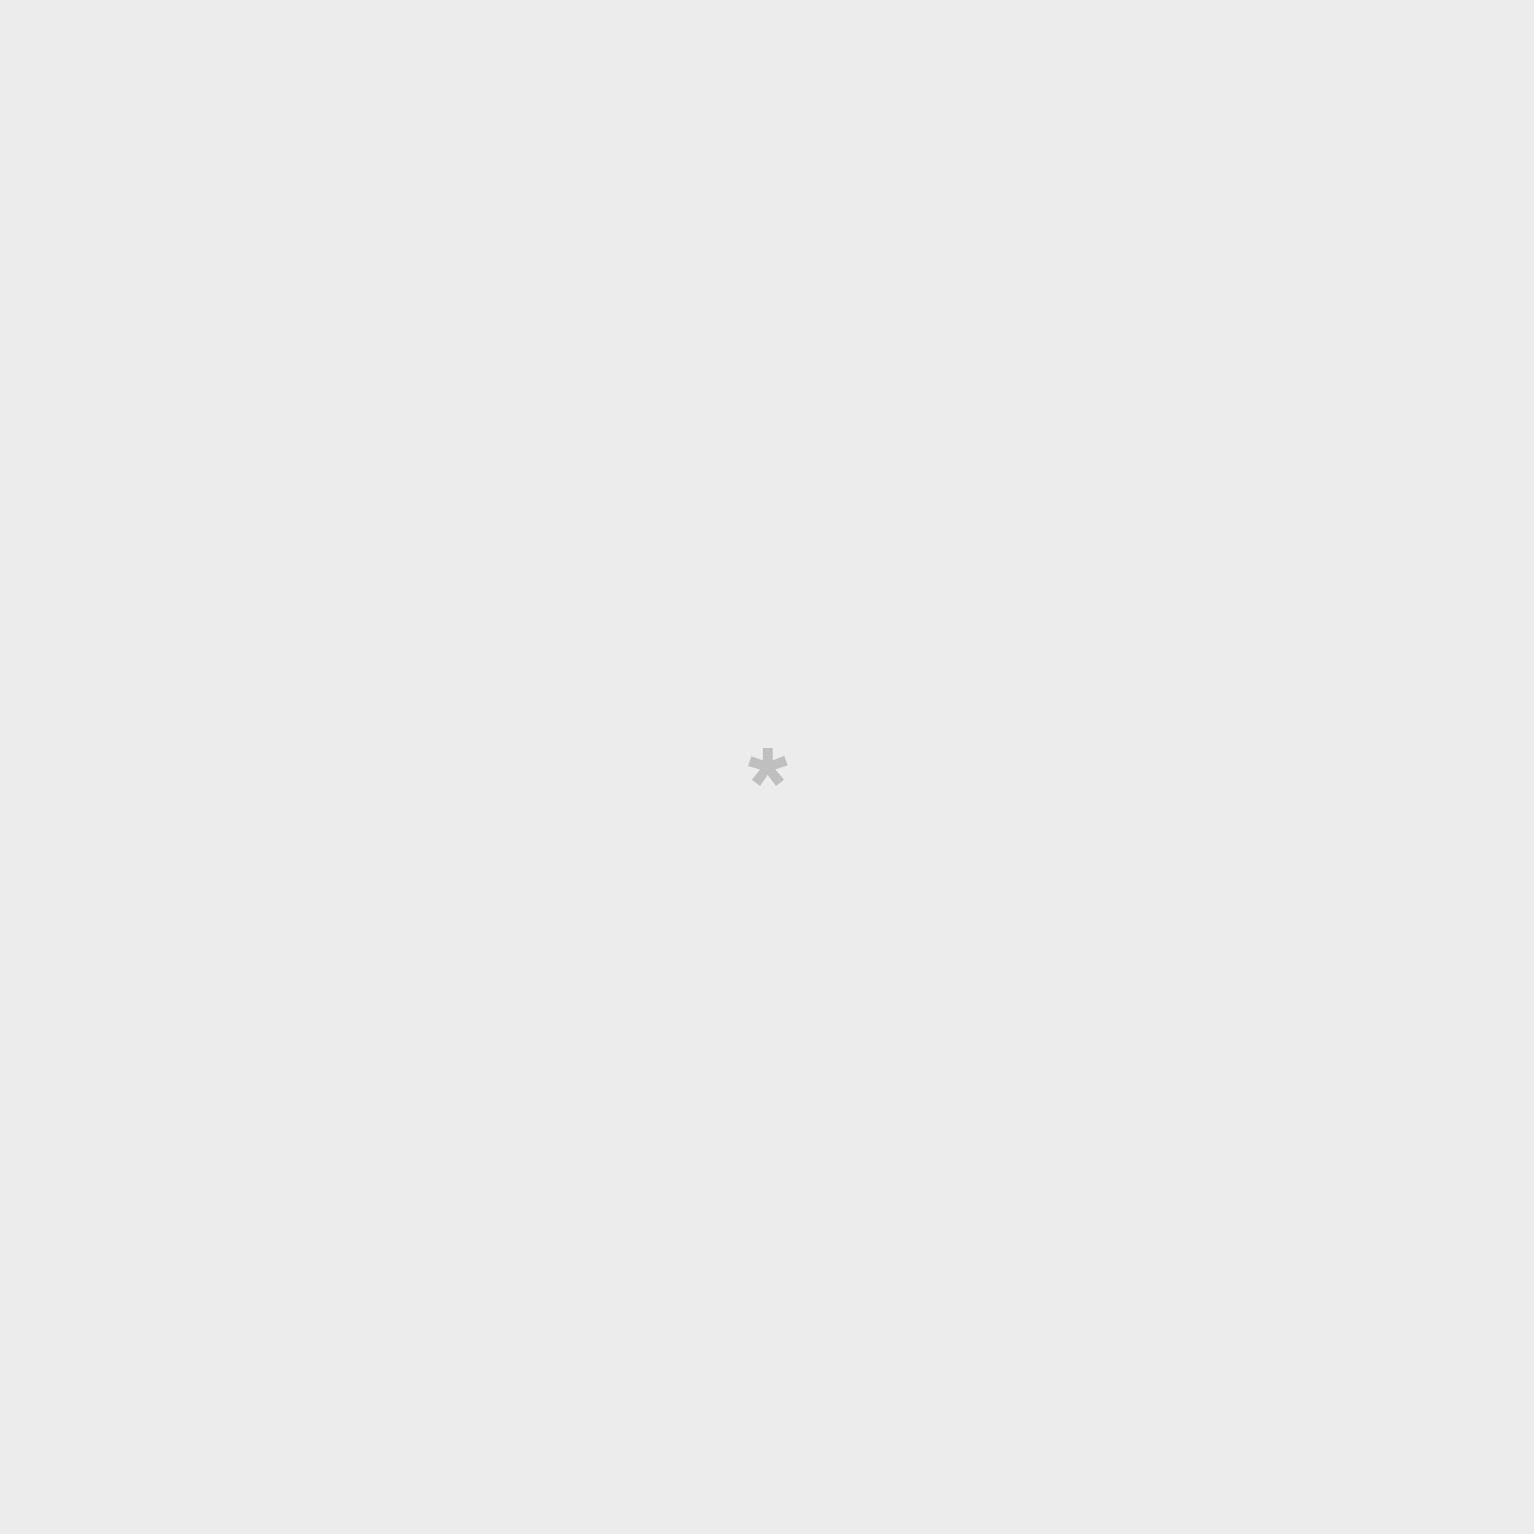 Mug - You brighten up my days (ENG)